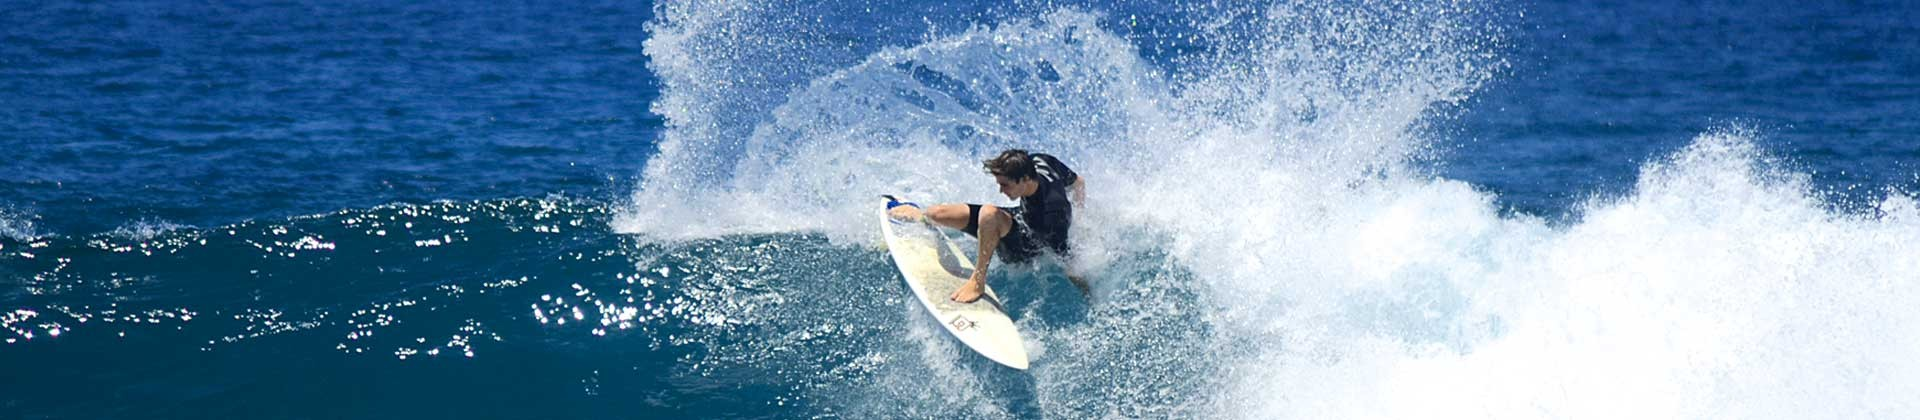 https://www.goodmorningtenerife.com/wp-content/uploads/2014/08/03_slide_sports_GM_Tenerife-1920x420.jpg